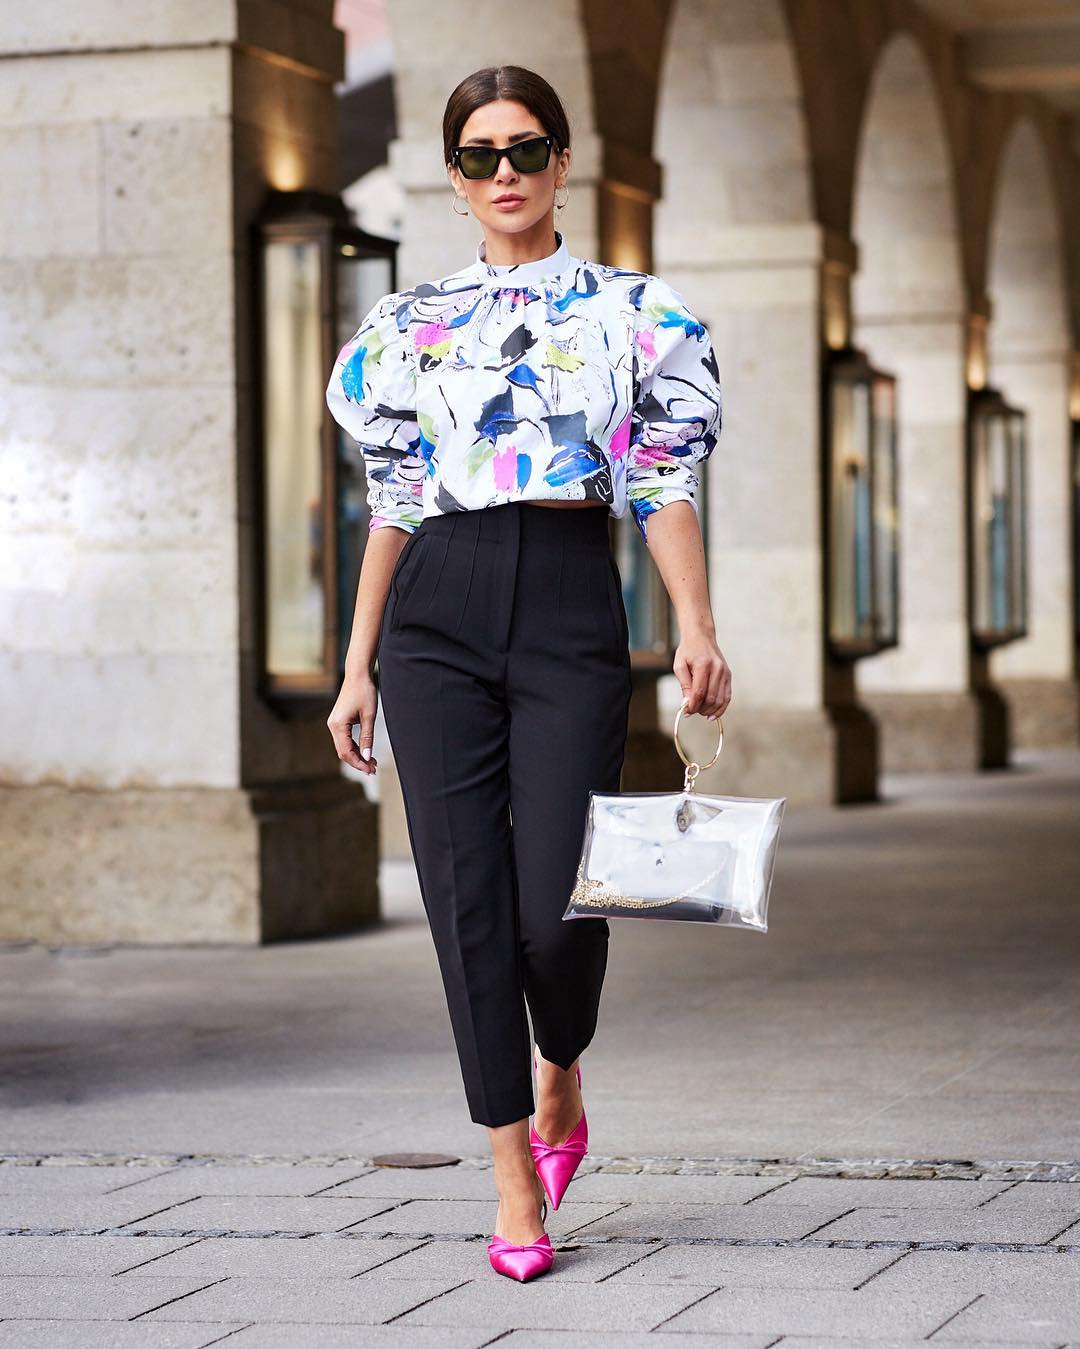 брюки женские 2019 фото 15